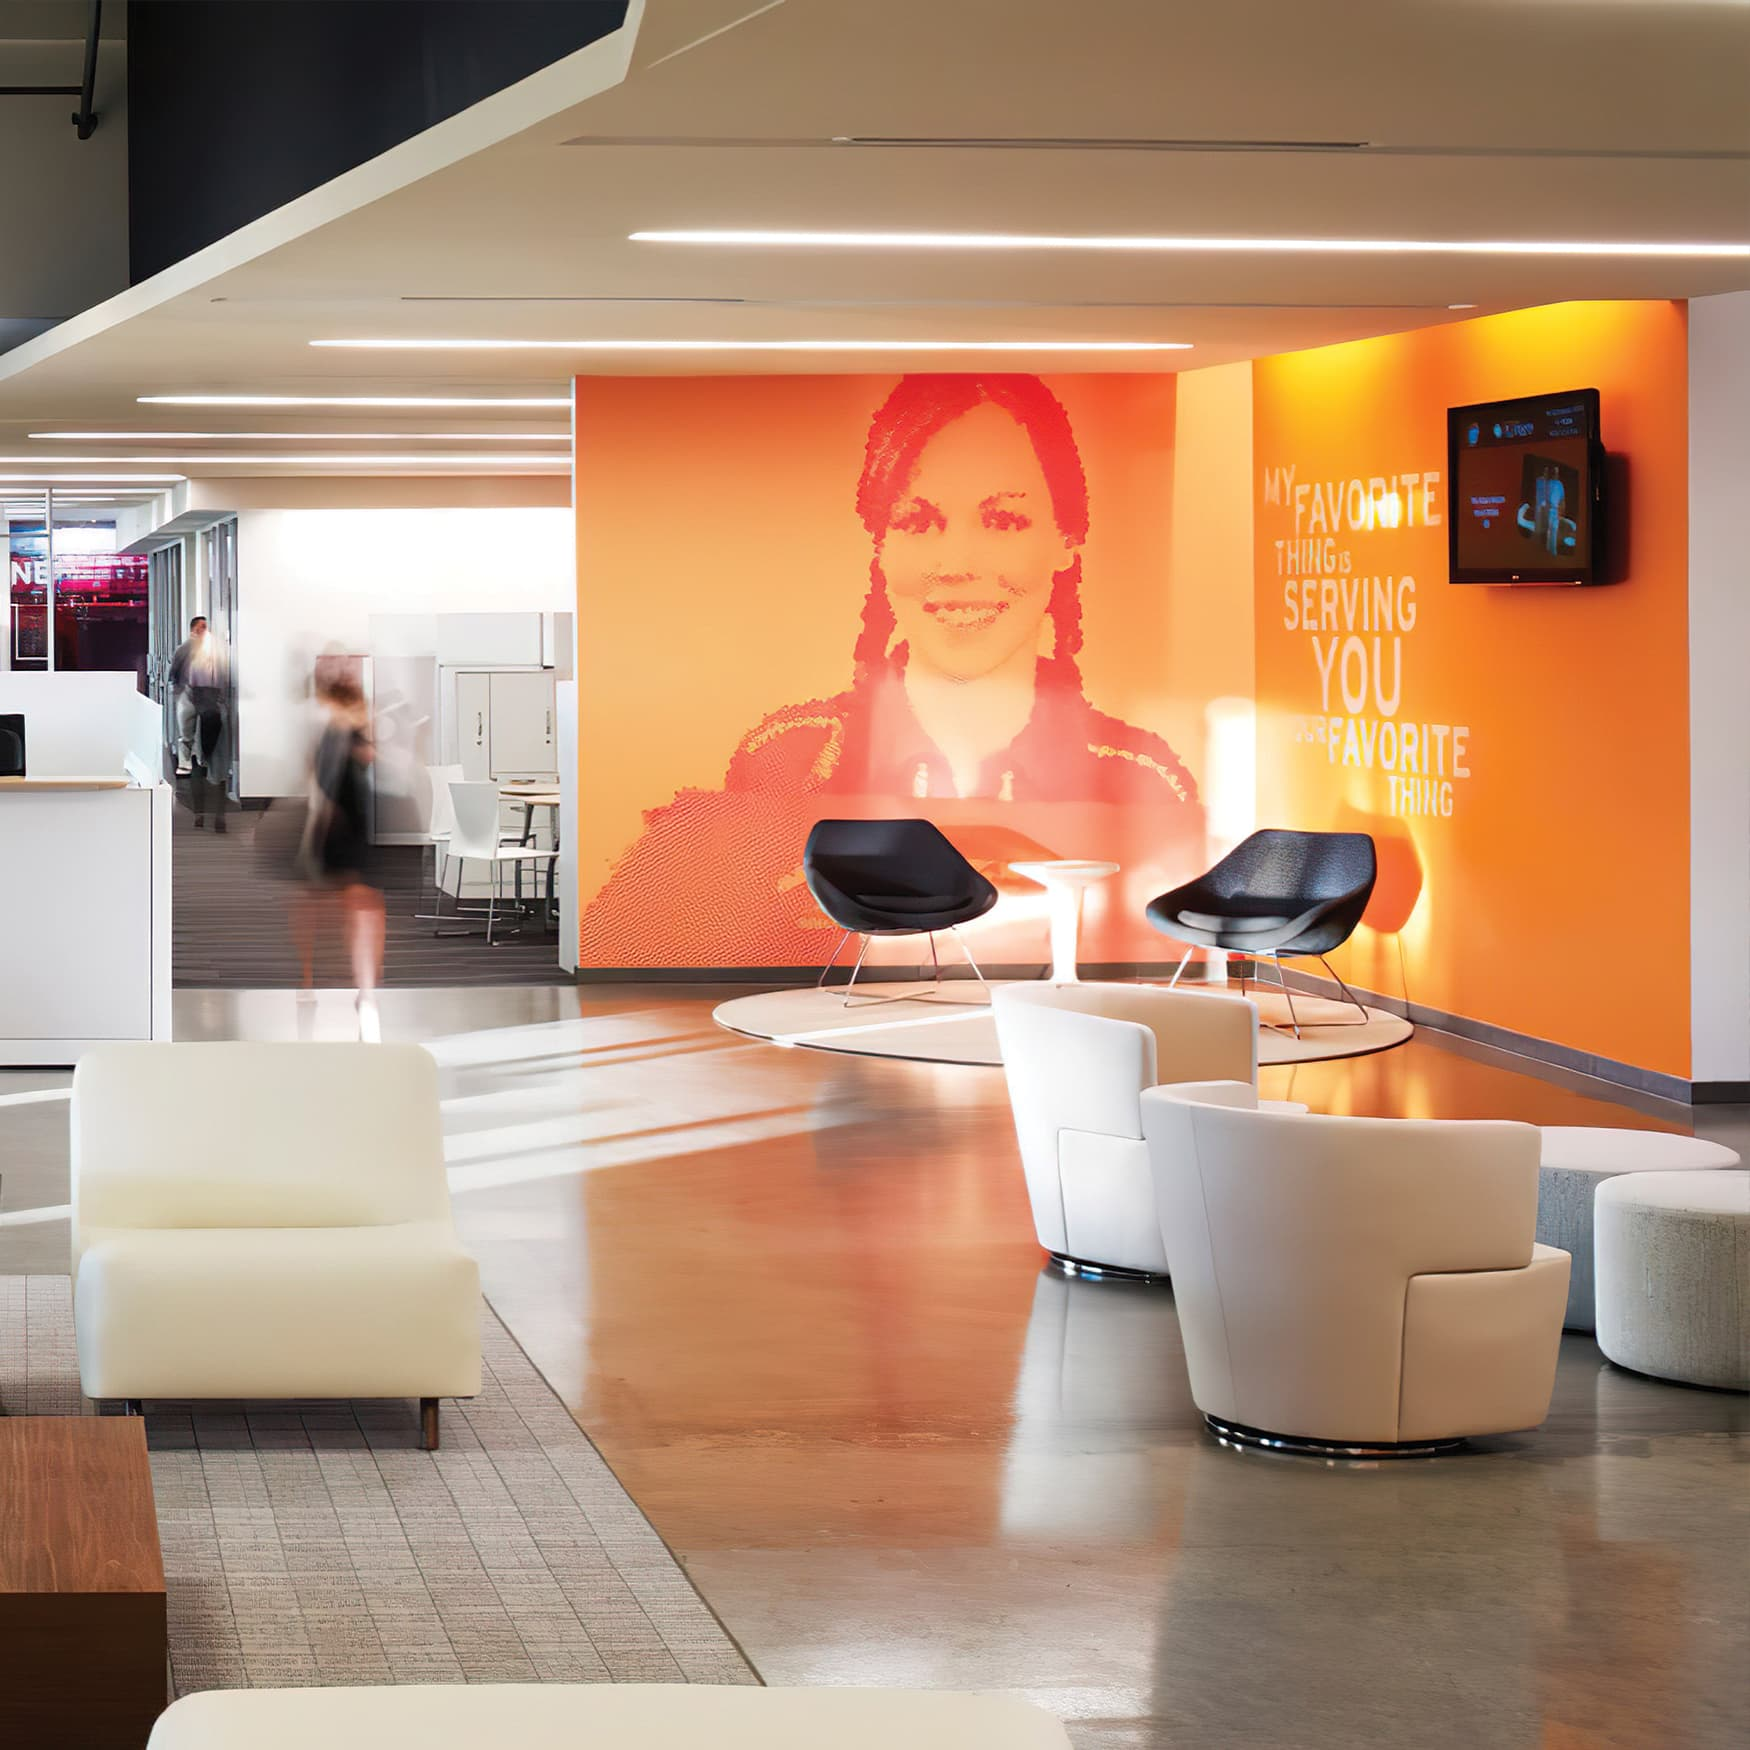 Pizza Hut corporate headquarters interior specialty graphics